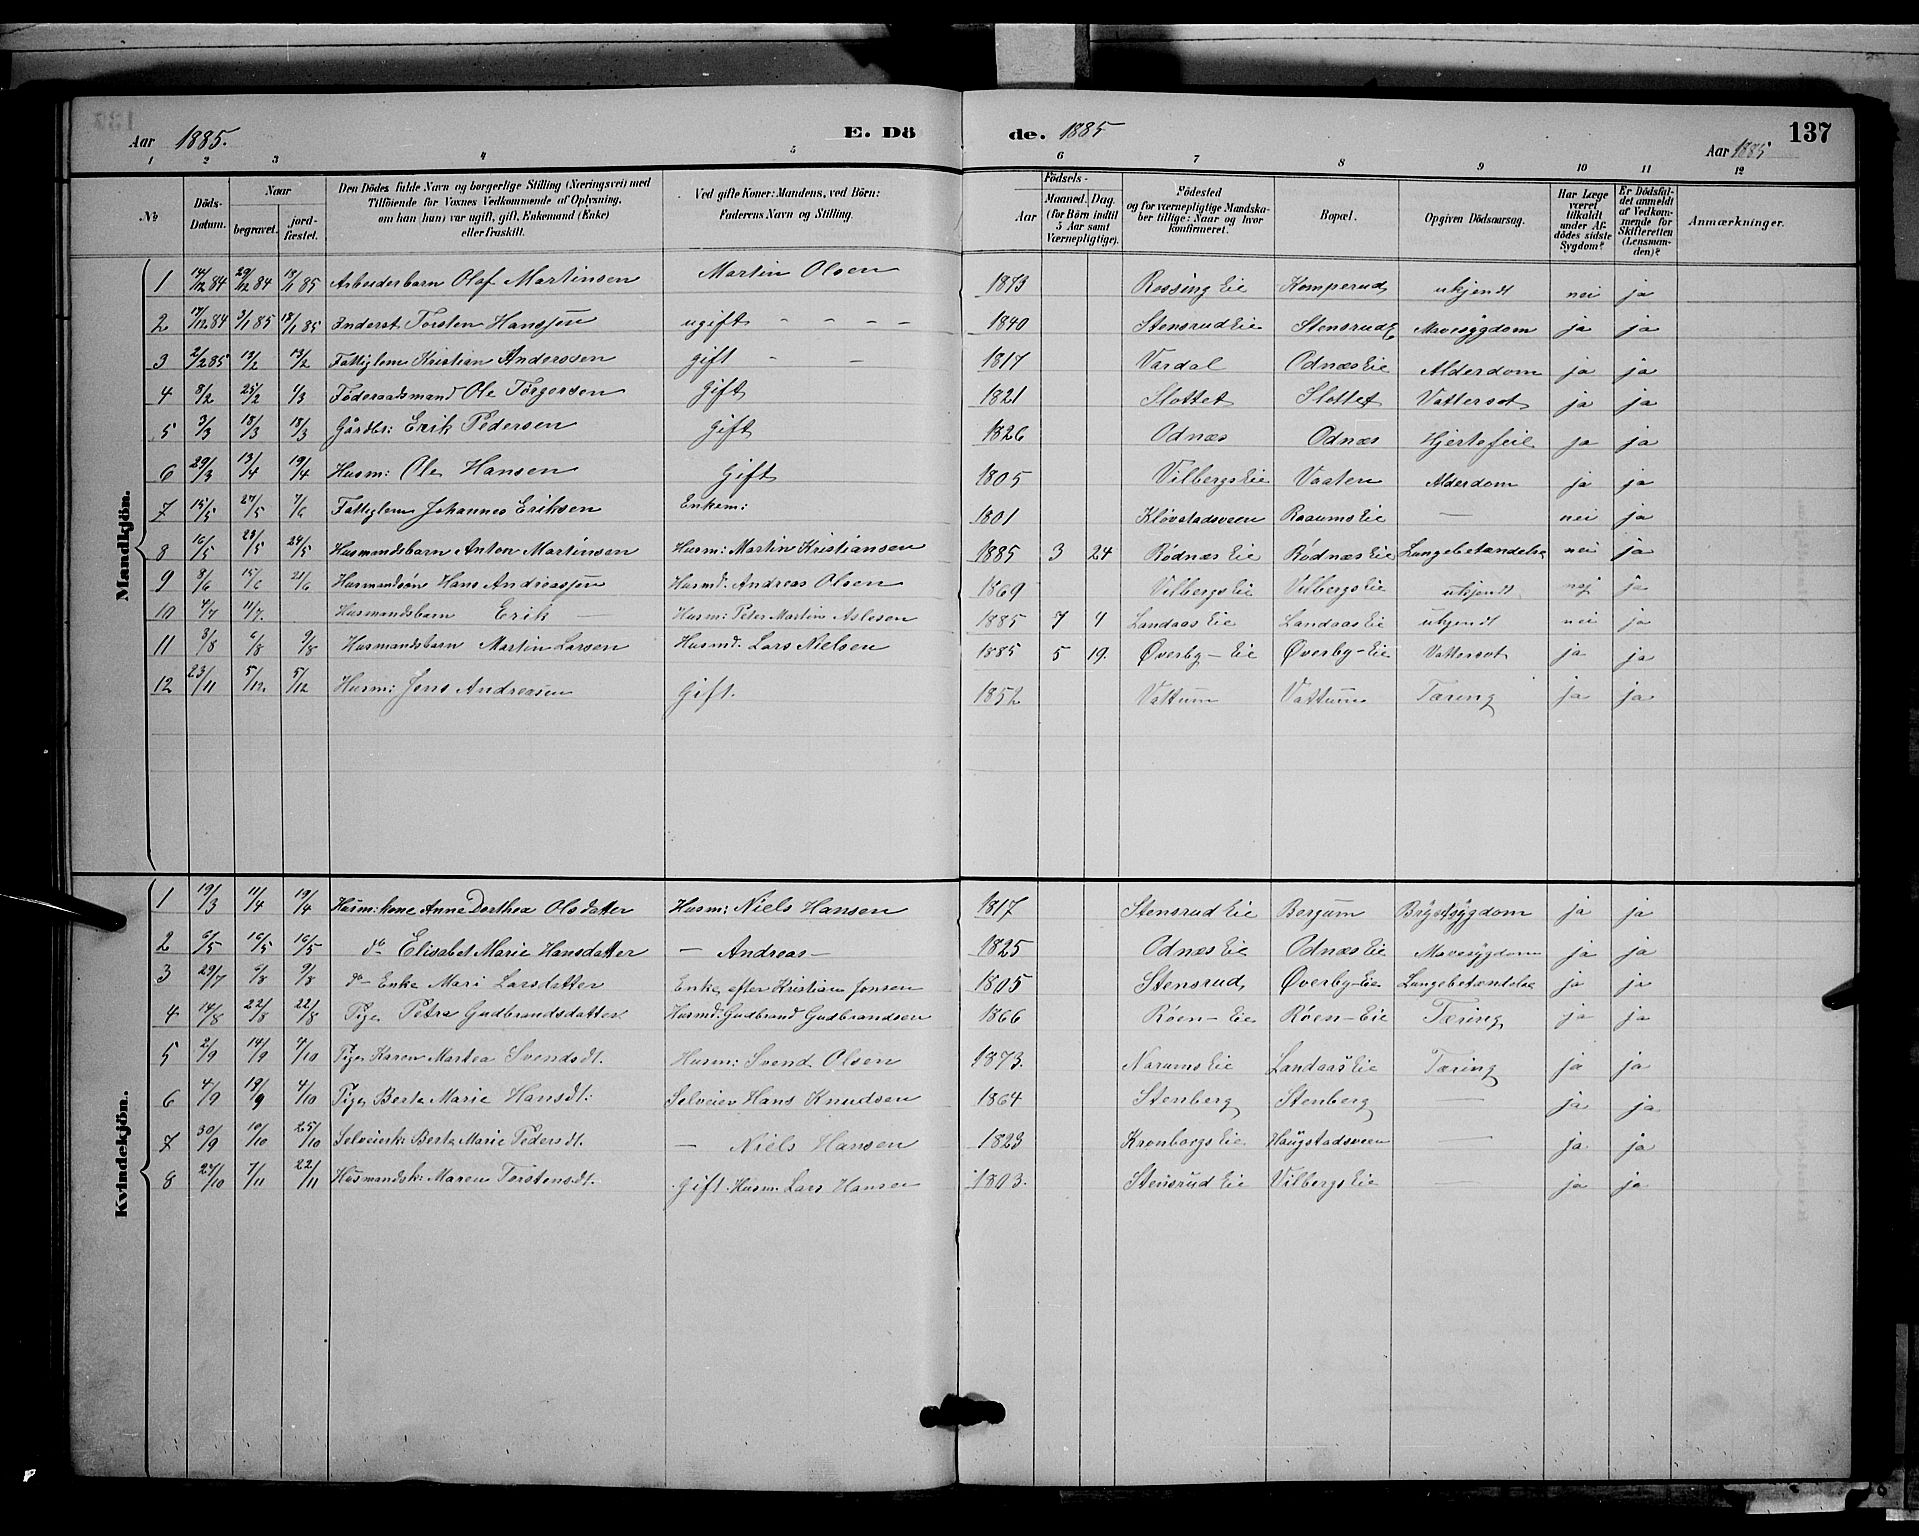 SAH, Søndre Land prestekontor, L/L0003: Klokkerbok nr. 3, 1884-1902, s. 137